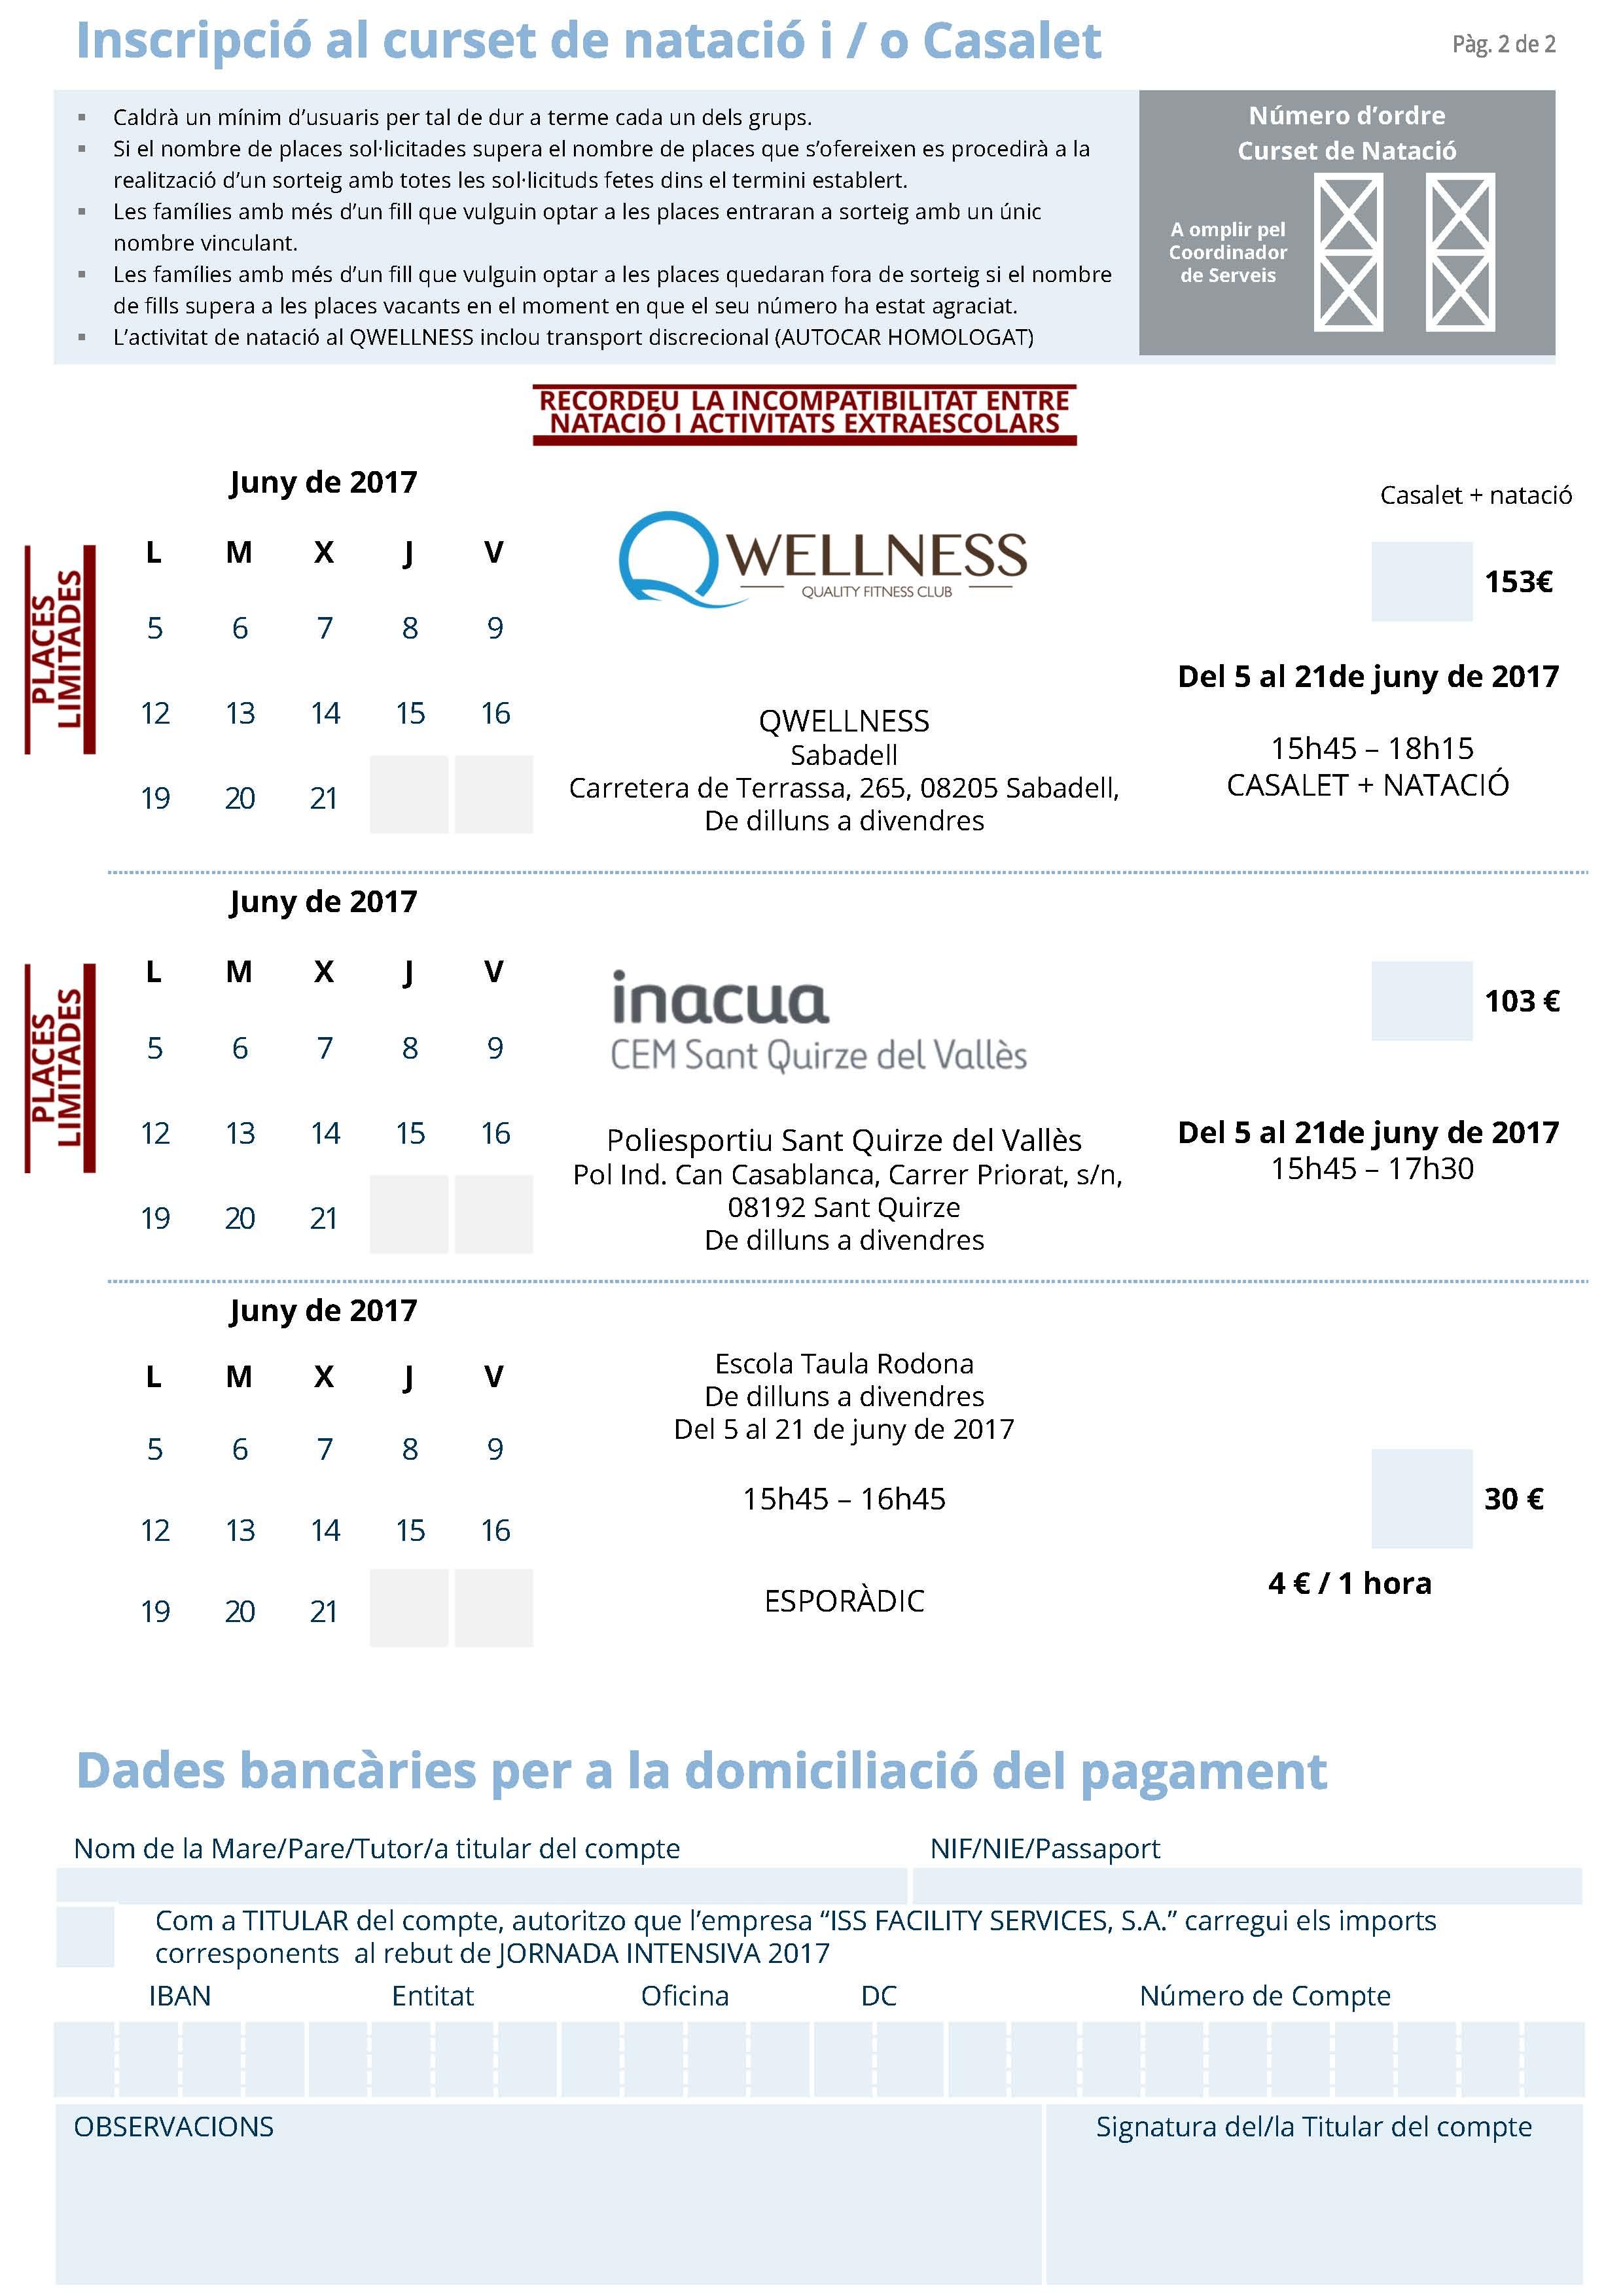 ESCOLA TAULA RODONA. JORNADA INTENSIVA 2016-2017 (005)_Página_2